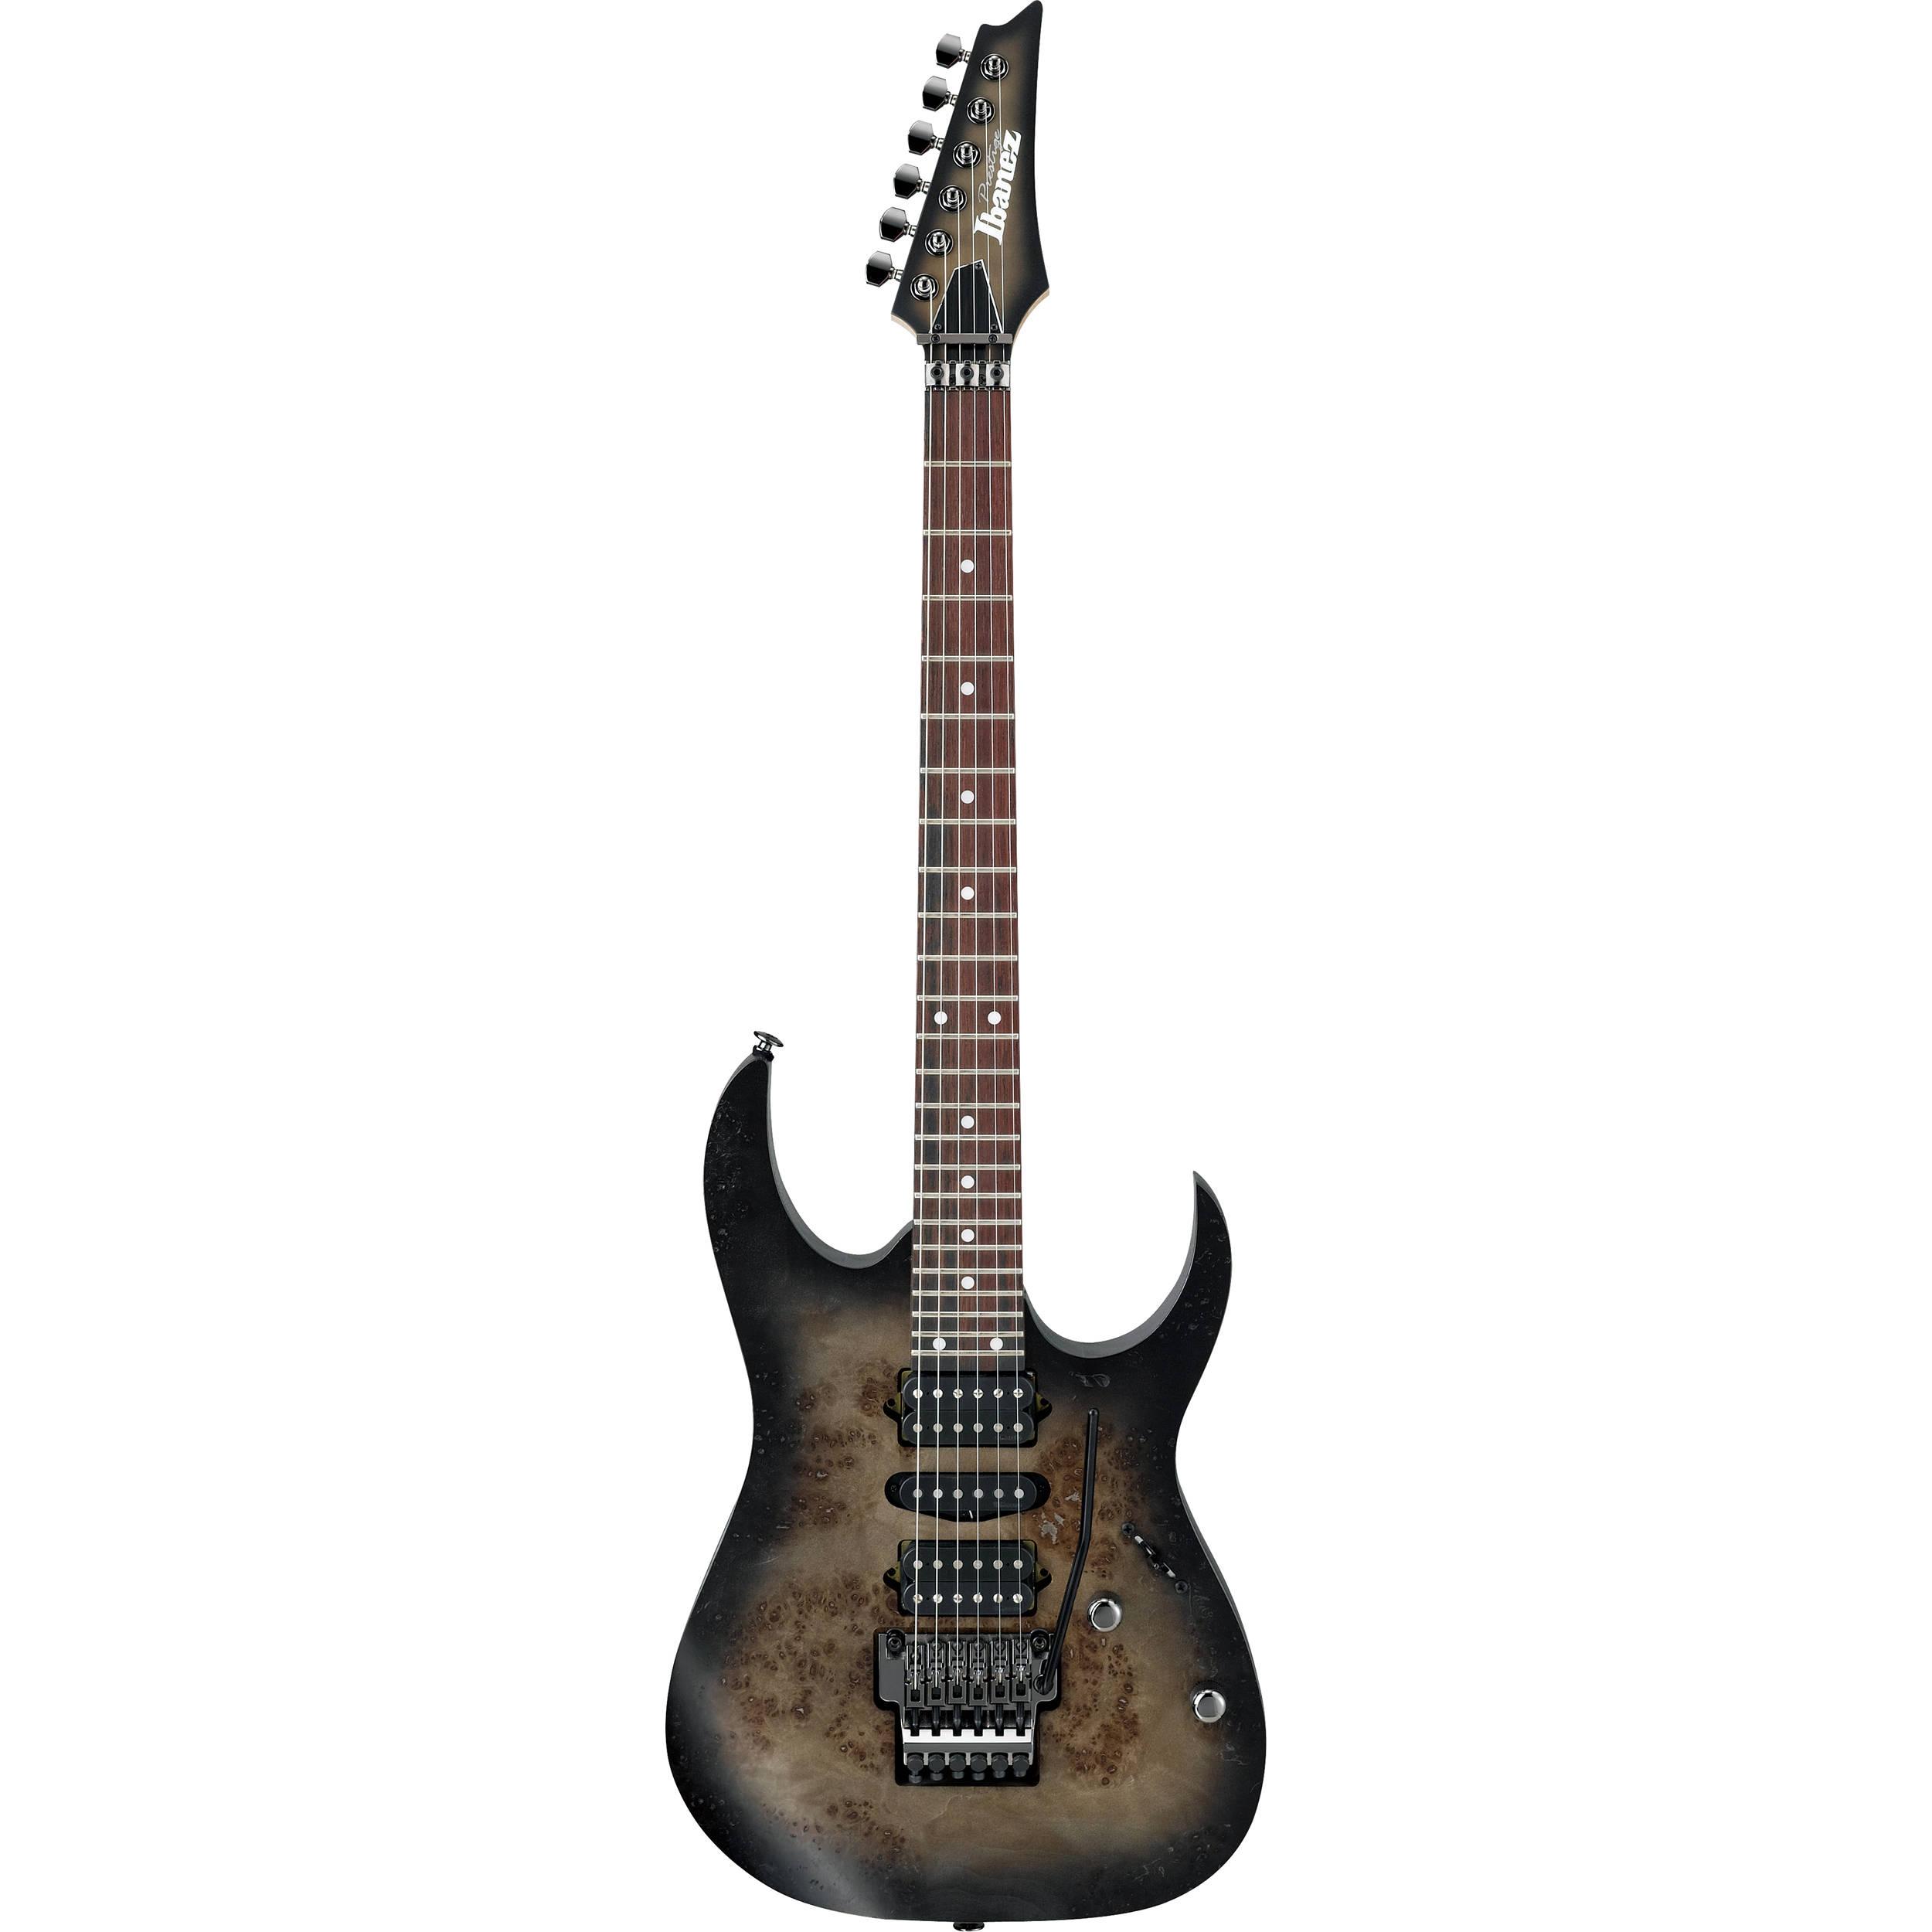 ibanez rg657pb rg prestige series electric guitar rg657pbagf b h. Black Bedroom Furniture Sets. Home Design Ideas